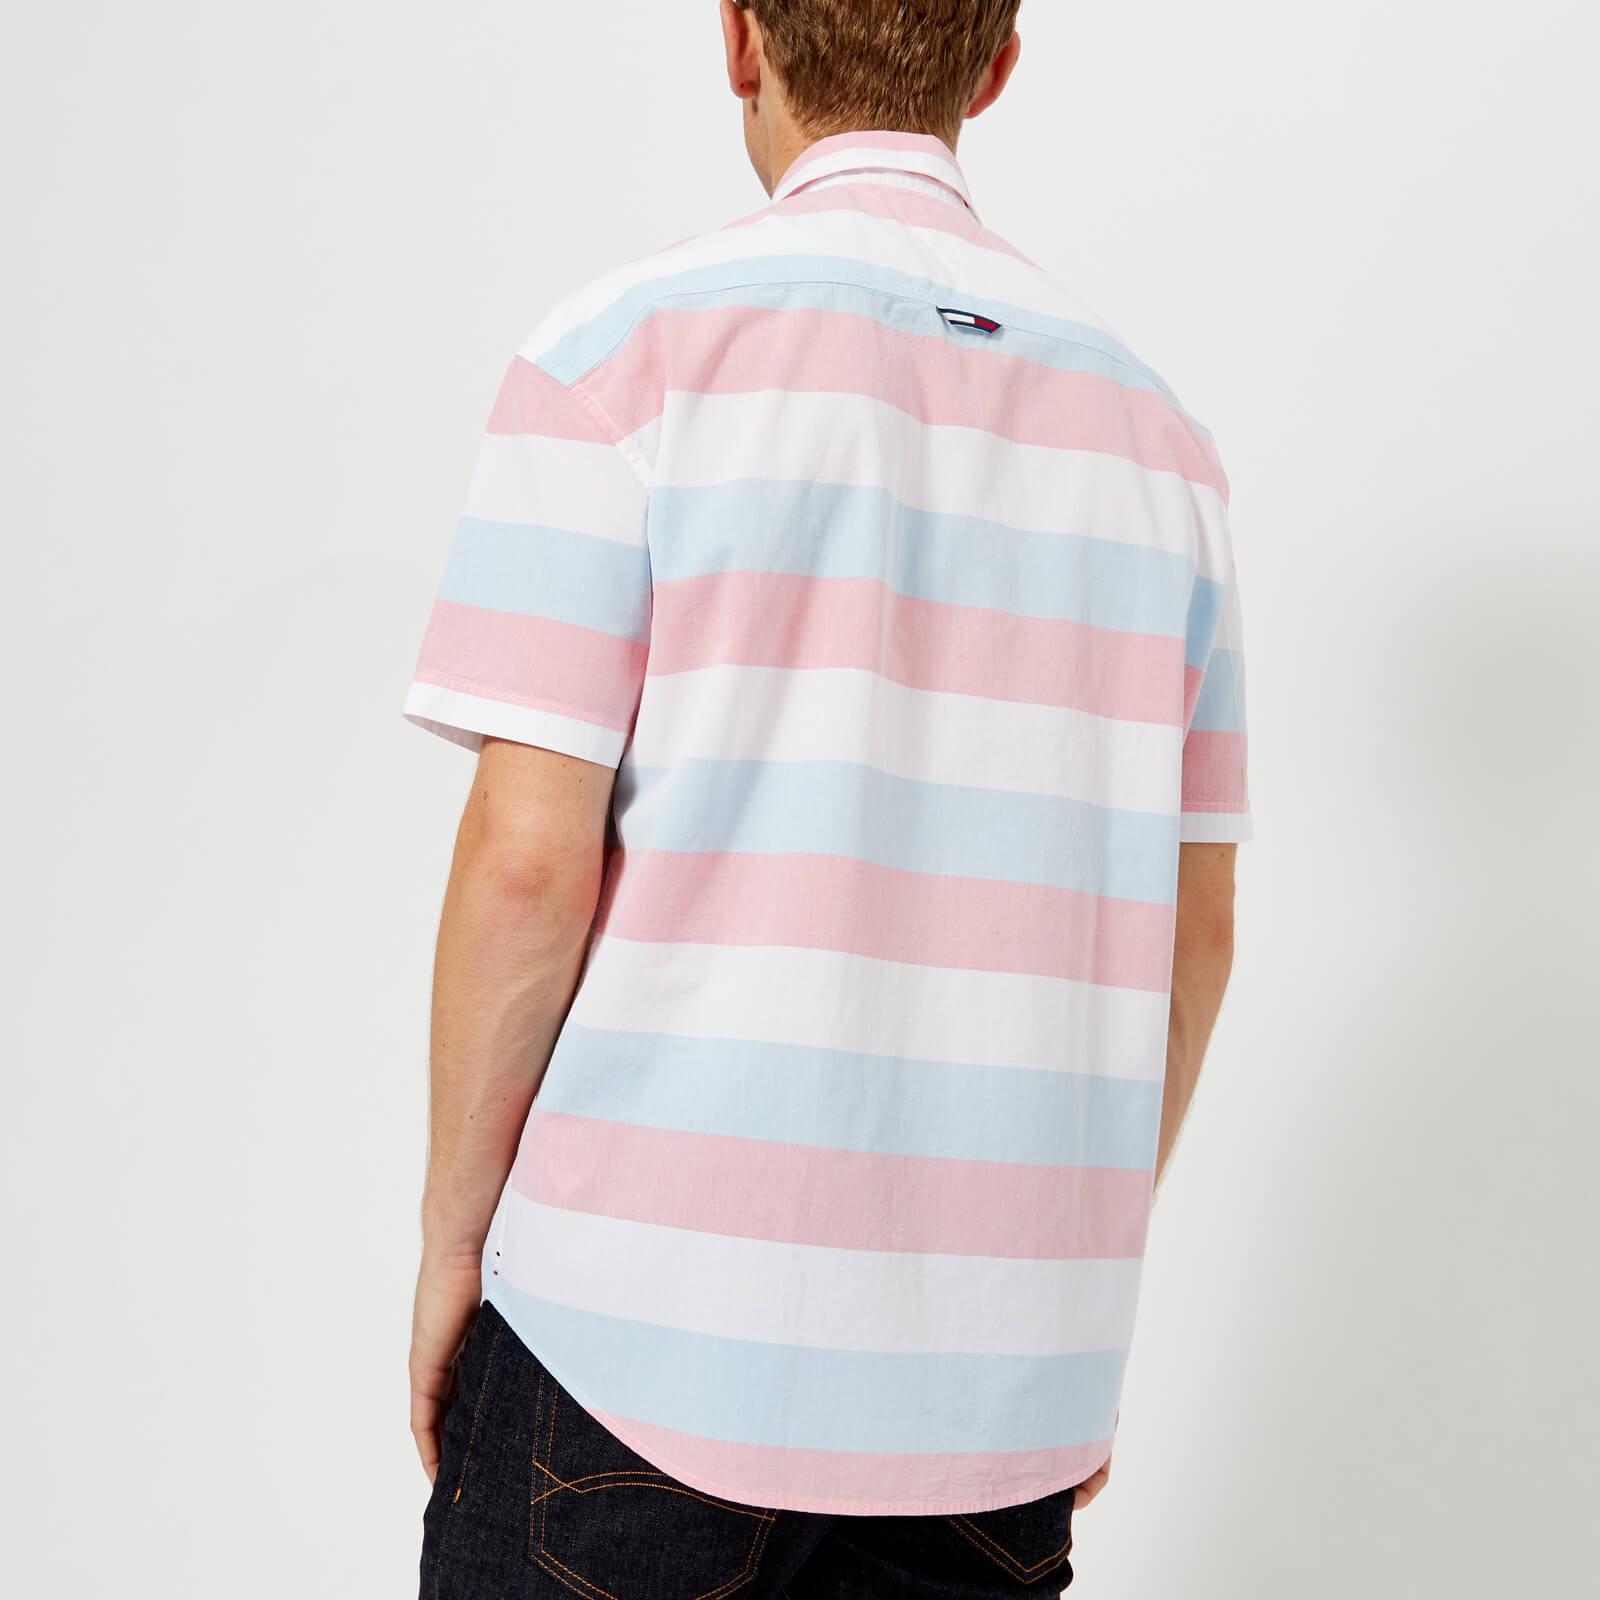 d56c52976a27 Lyst - Tommy Hilfiger Summer Stripe Short Sleeve Shirt for Men